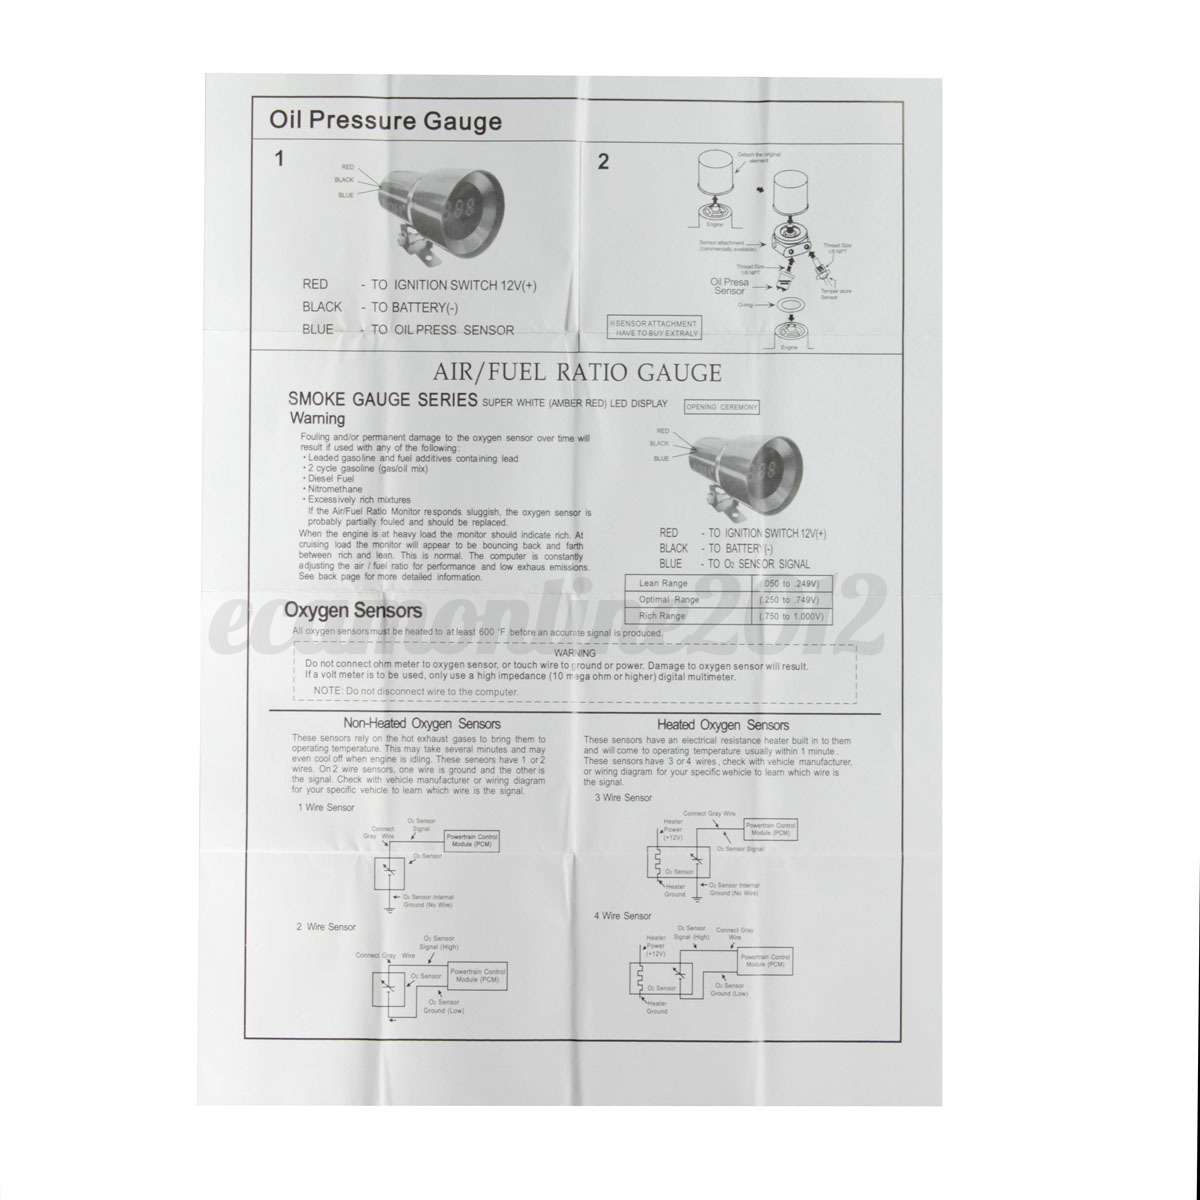 Breathtaking Mins N14 Engine Diagram Ideas - Best Image Diagram ...